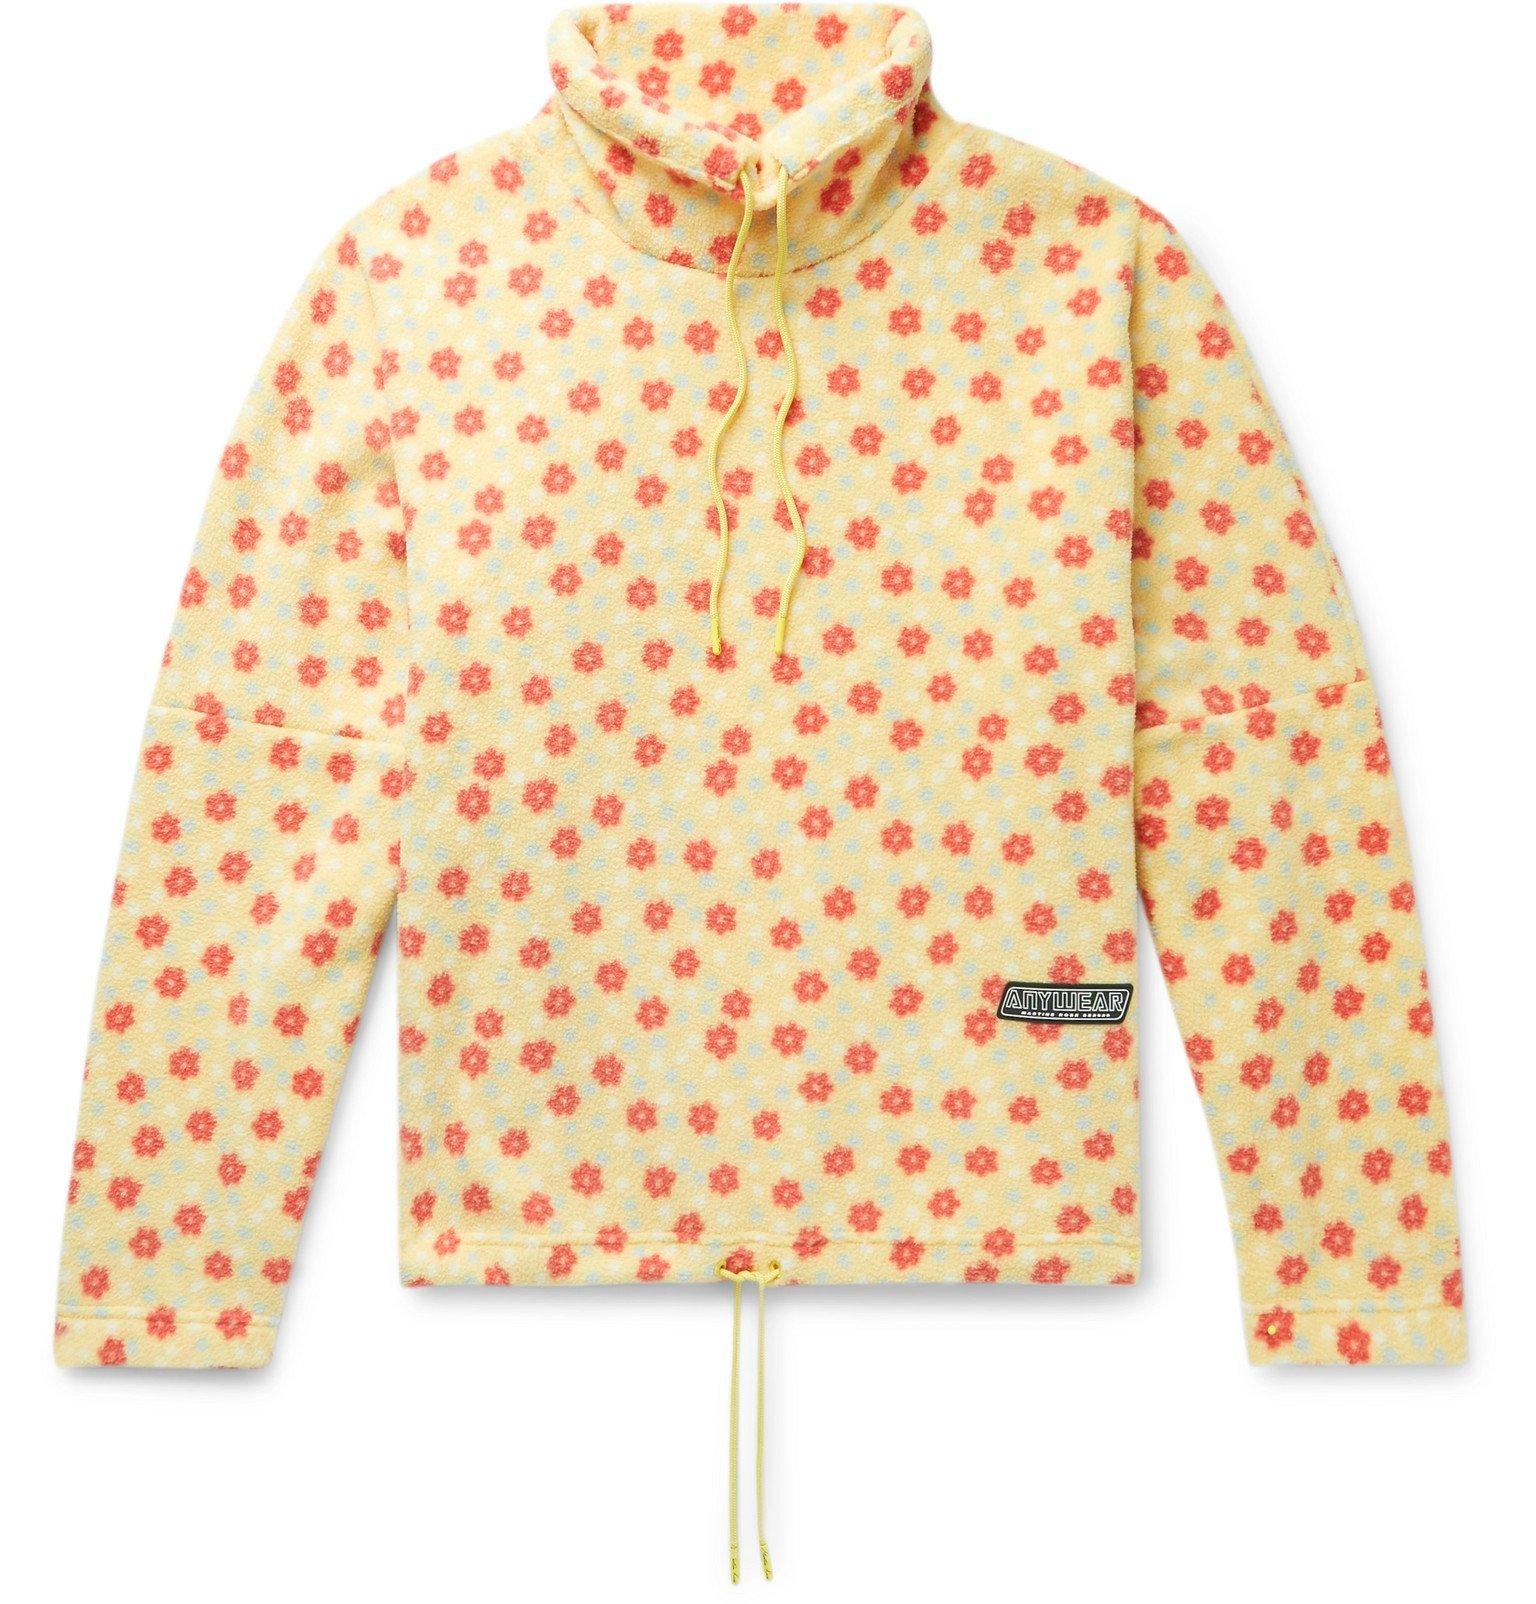 Martine Rose - Bongo Batwing Oversized Floral-Print Fleece Sweashirt - Yellow